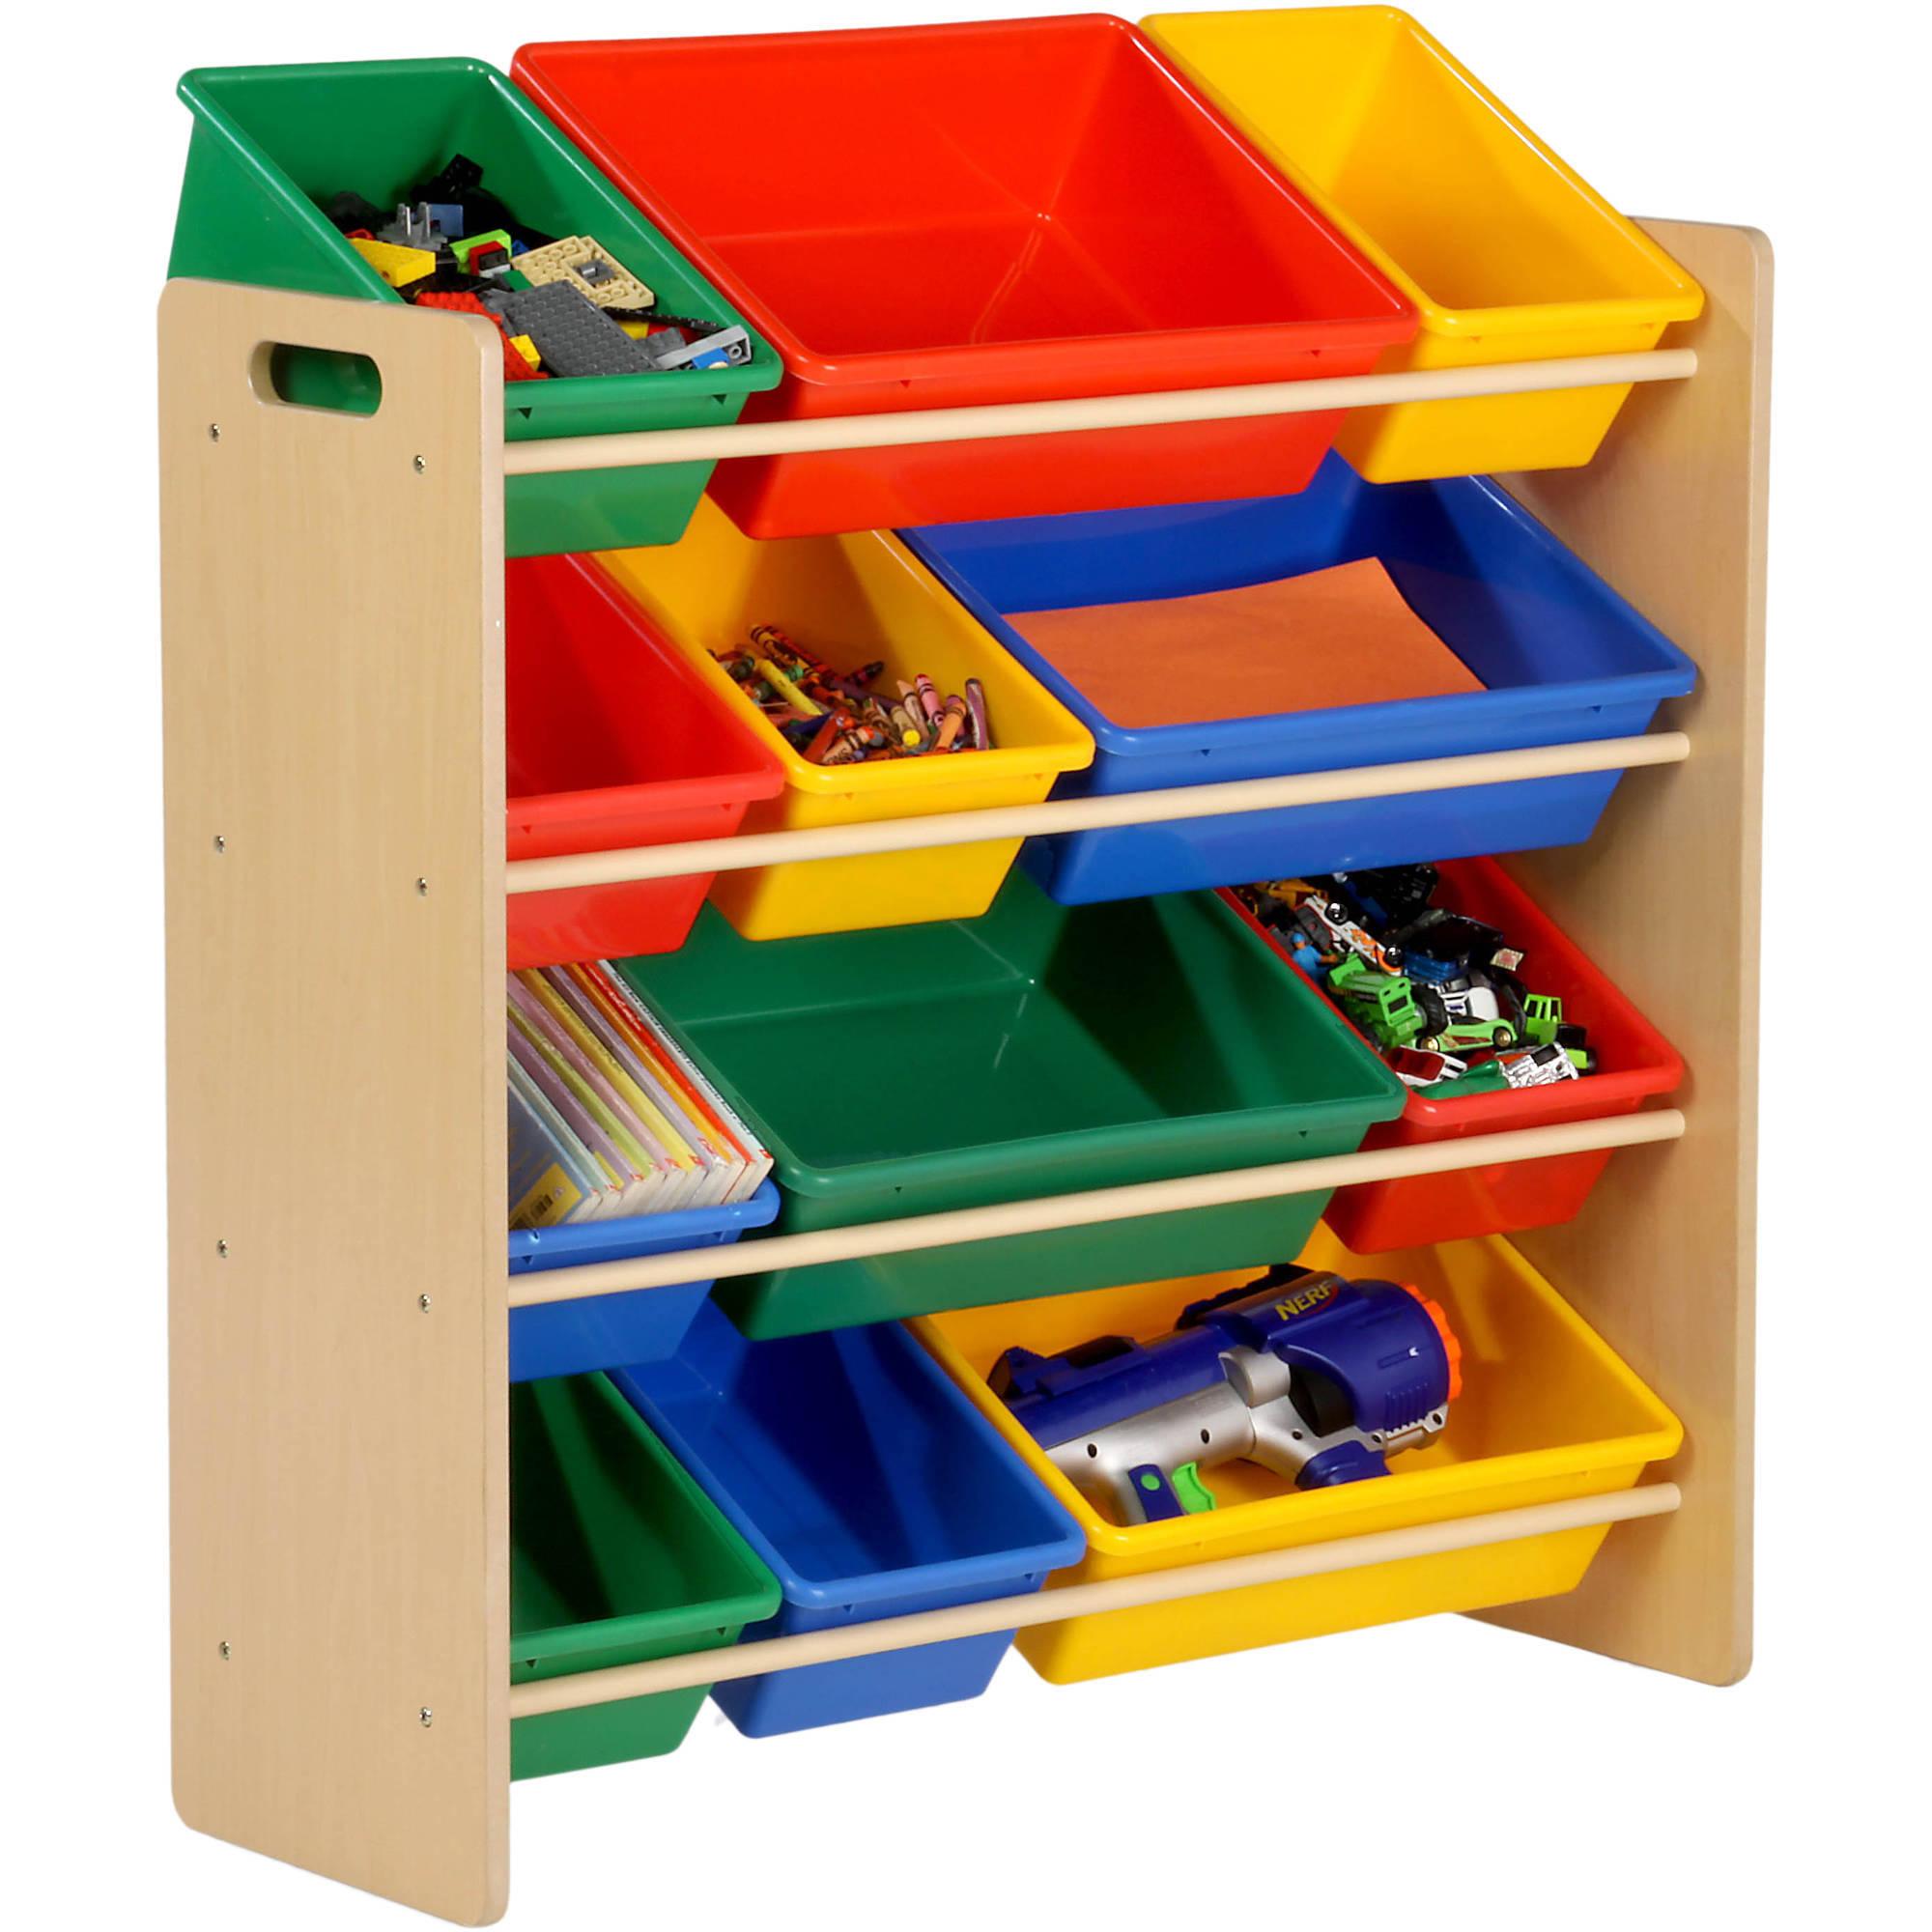 storagestorage ribbon pin medium target tubsroom tub tubs pay expect essentials storage turqu less room more